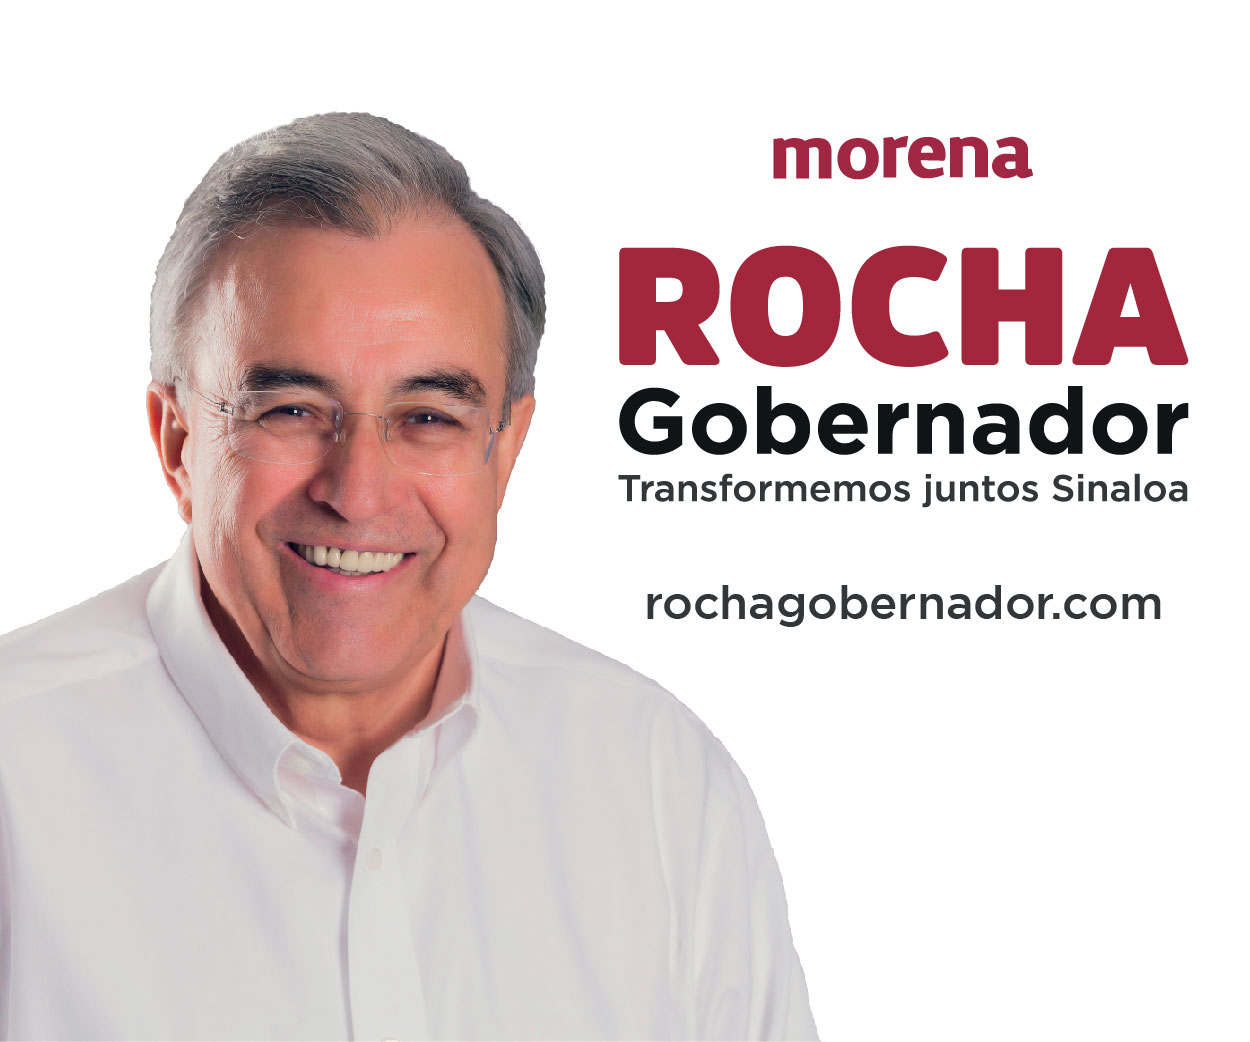 ROCHA